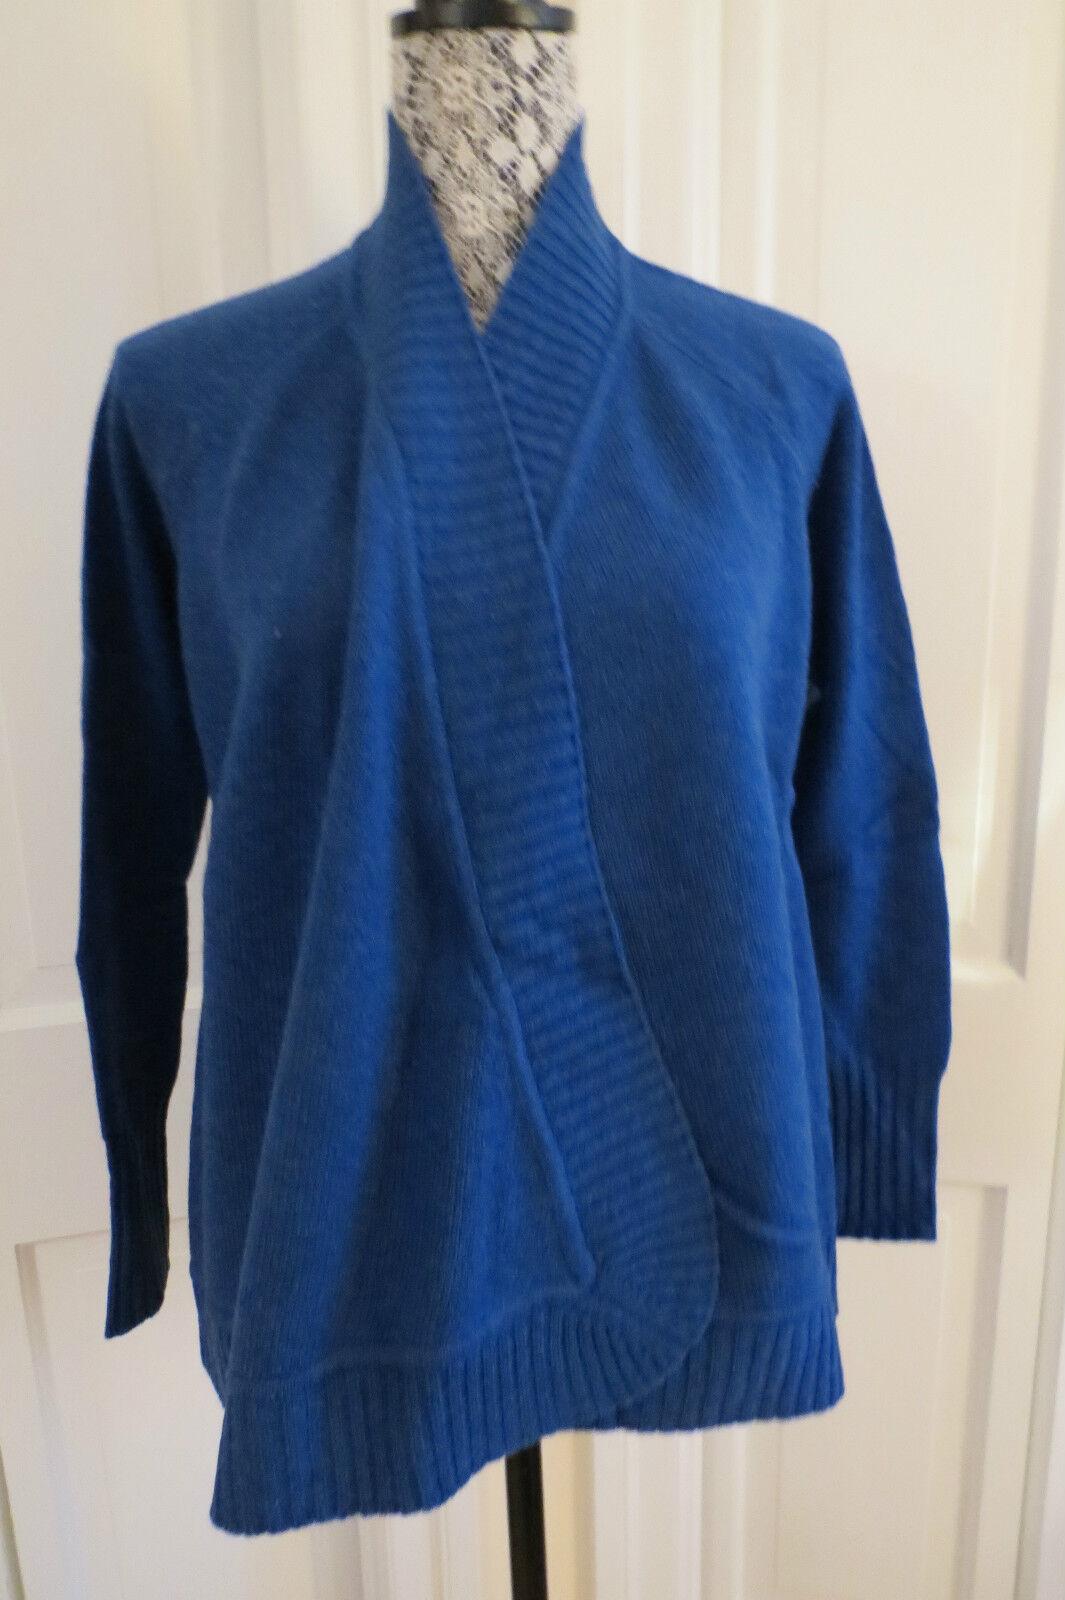 Forte Kinross Cashmere Lapis Shawl Collar Cashmere Cardigan – Small NWT  396